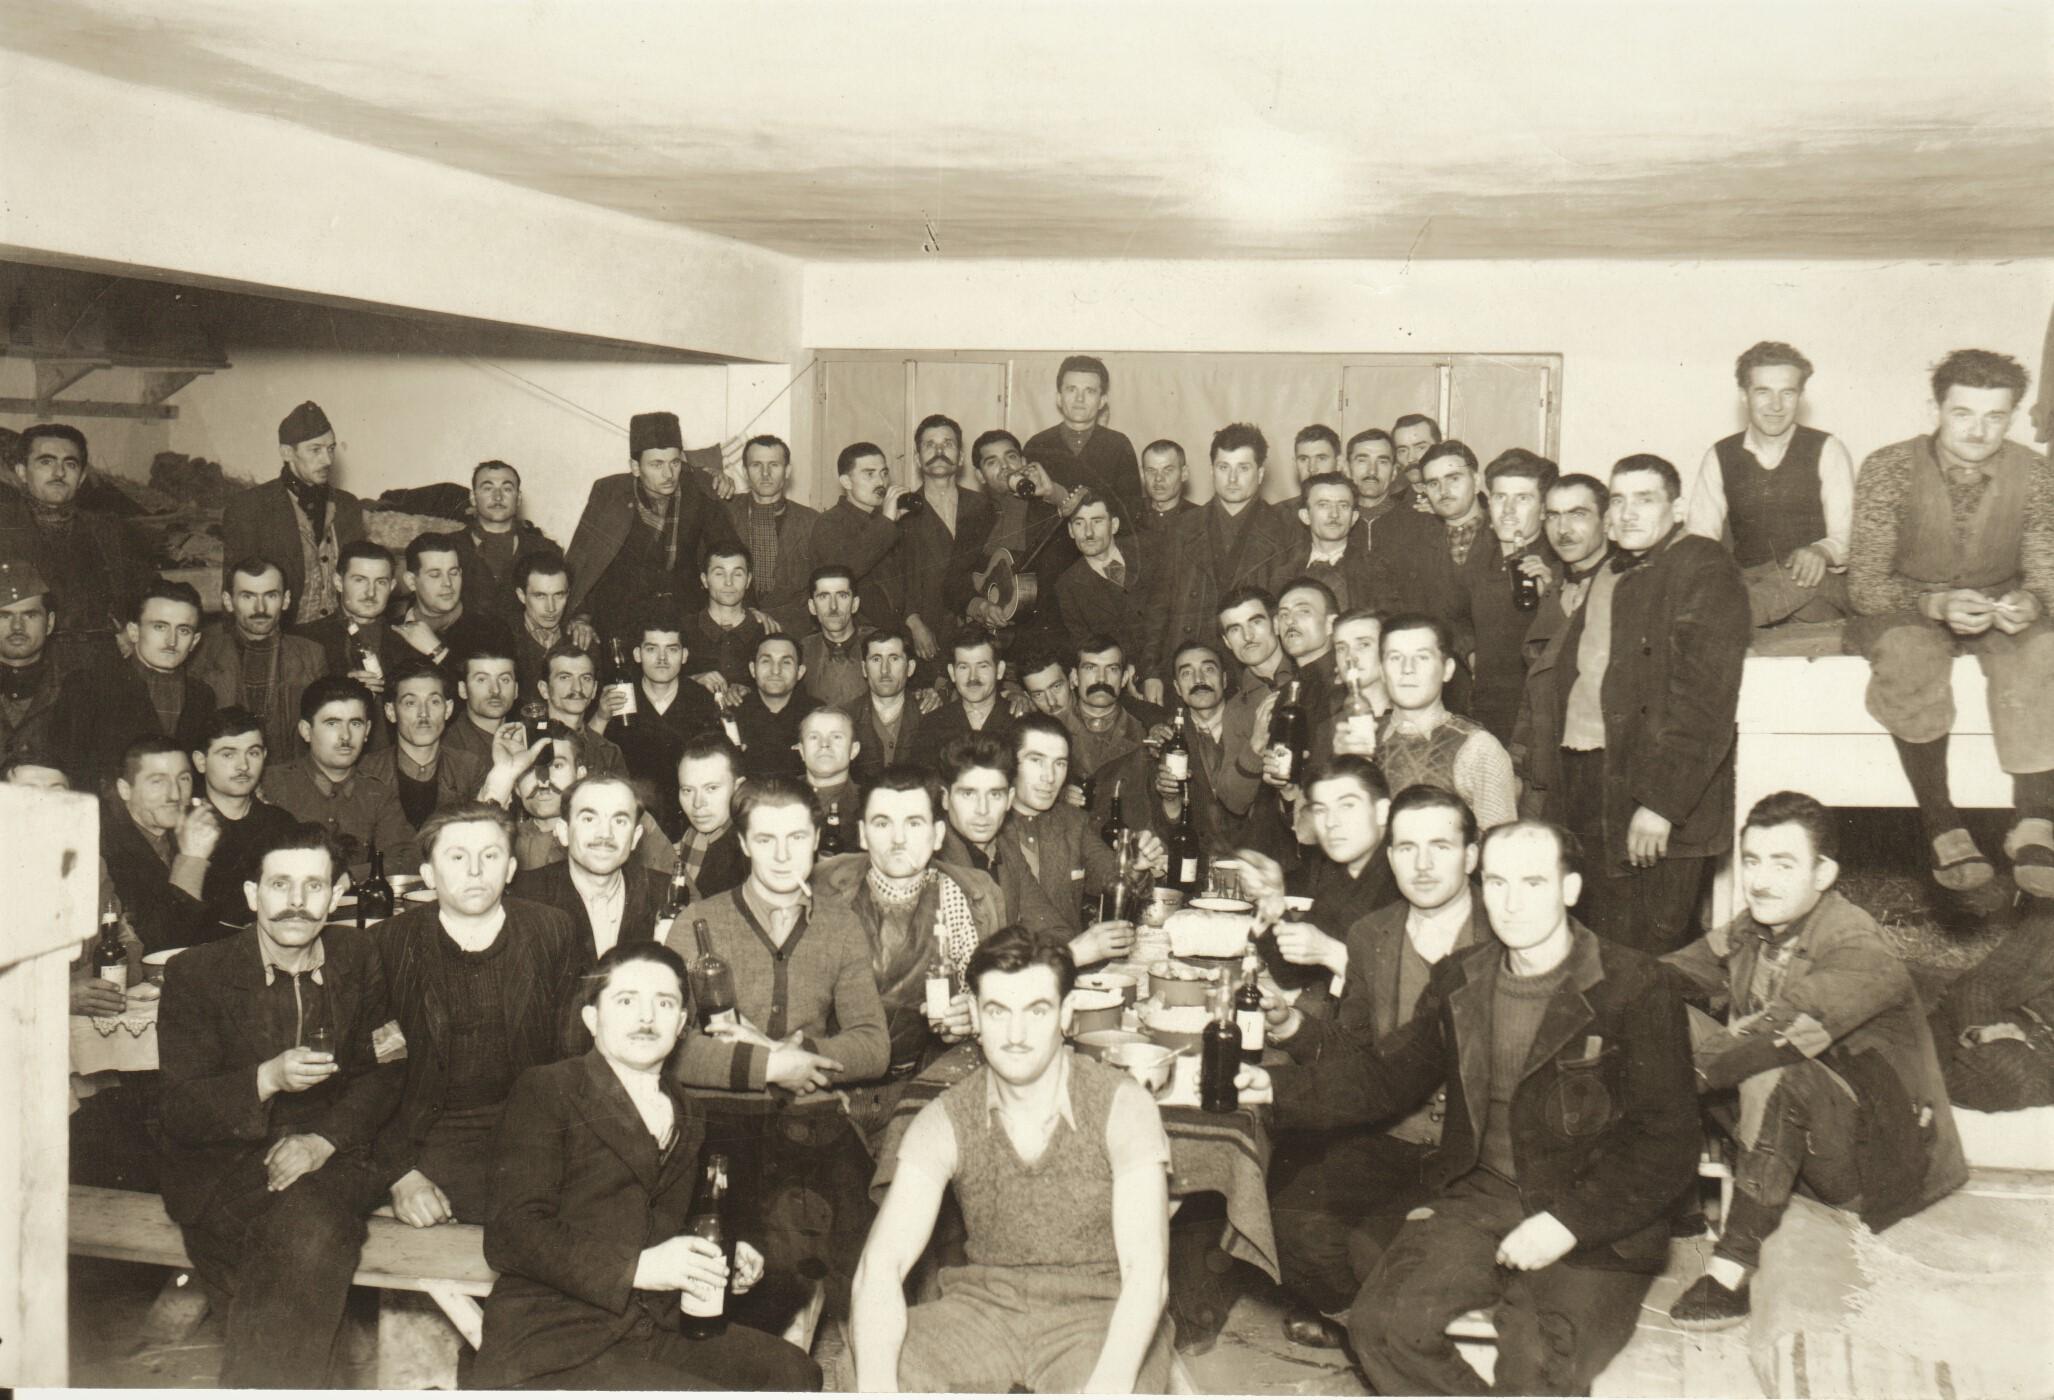 85_253_64_jugoszlav_munkaszolgalatosok_csoportja_a_vasgyarban_1941.jpg